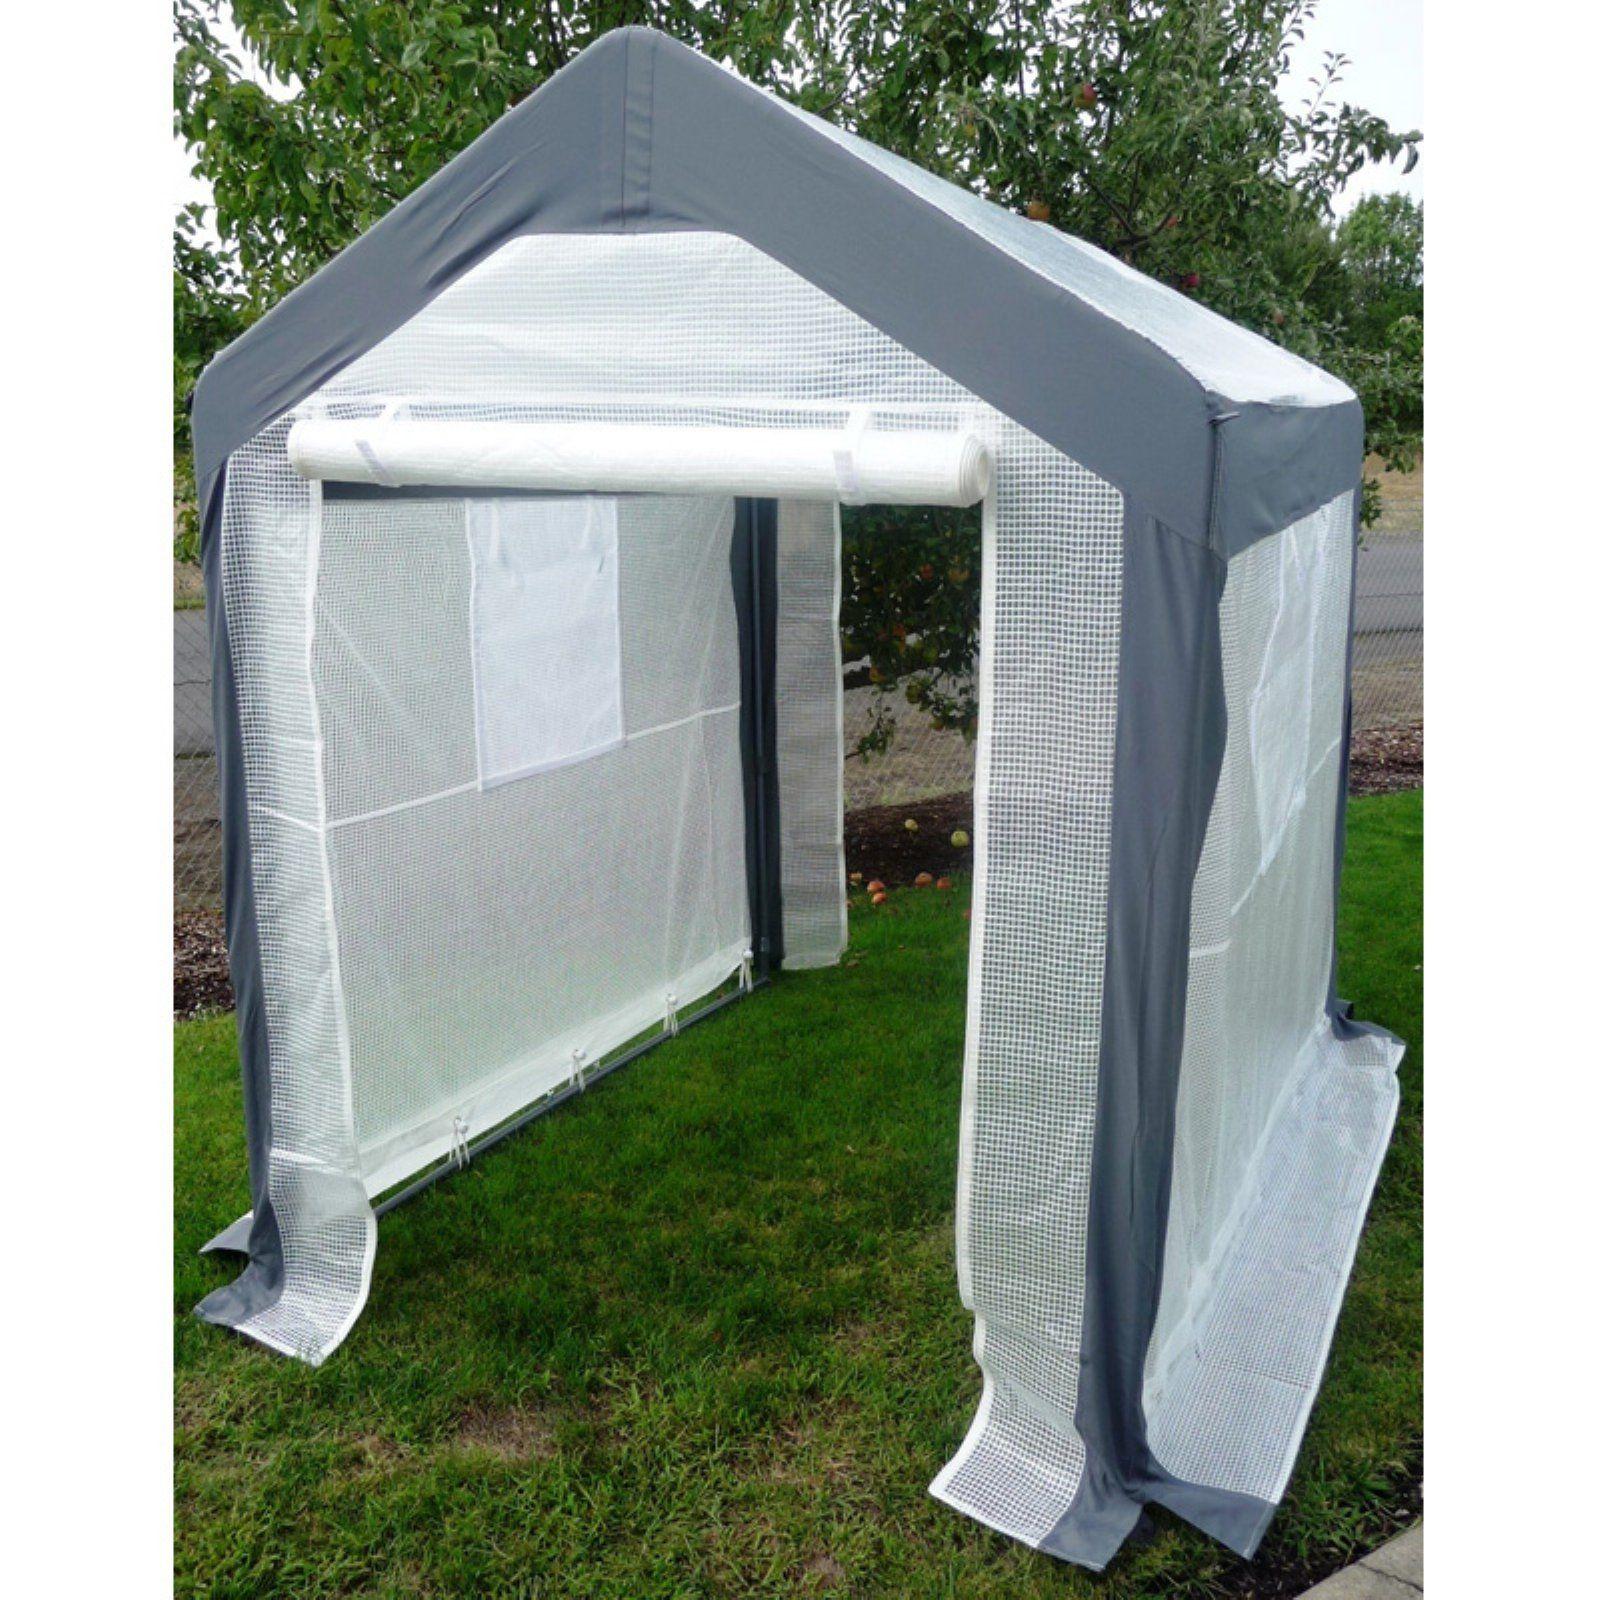 Spring Gardener Gable Greenhouse - 6L x 5W x 6 6H ft